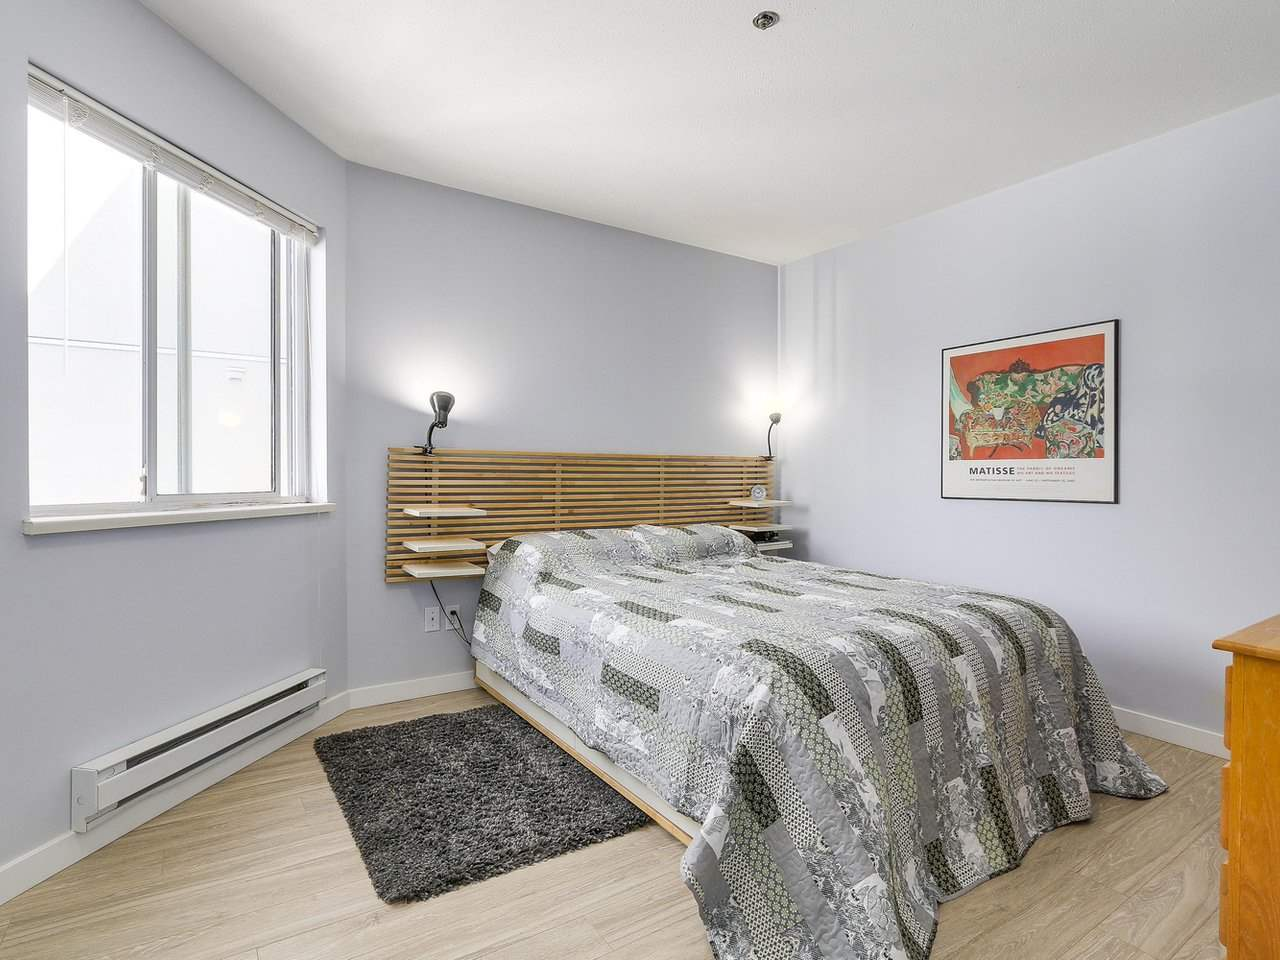 Condo Apartment at 301 120 GARDEN DRIVE, Unit 301, Vancouver East, British Columbia. Image 12